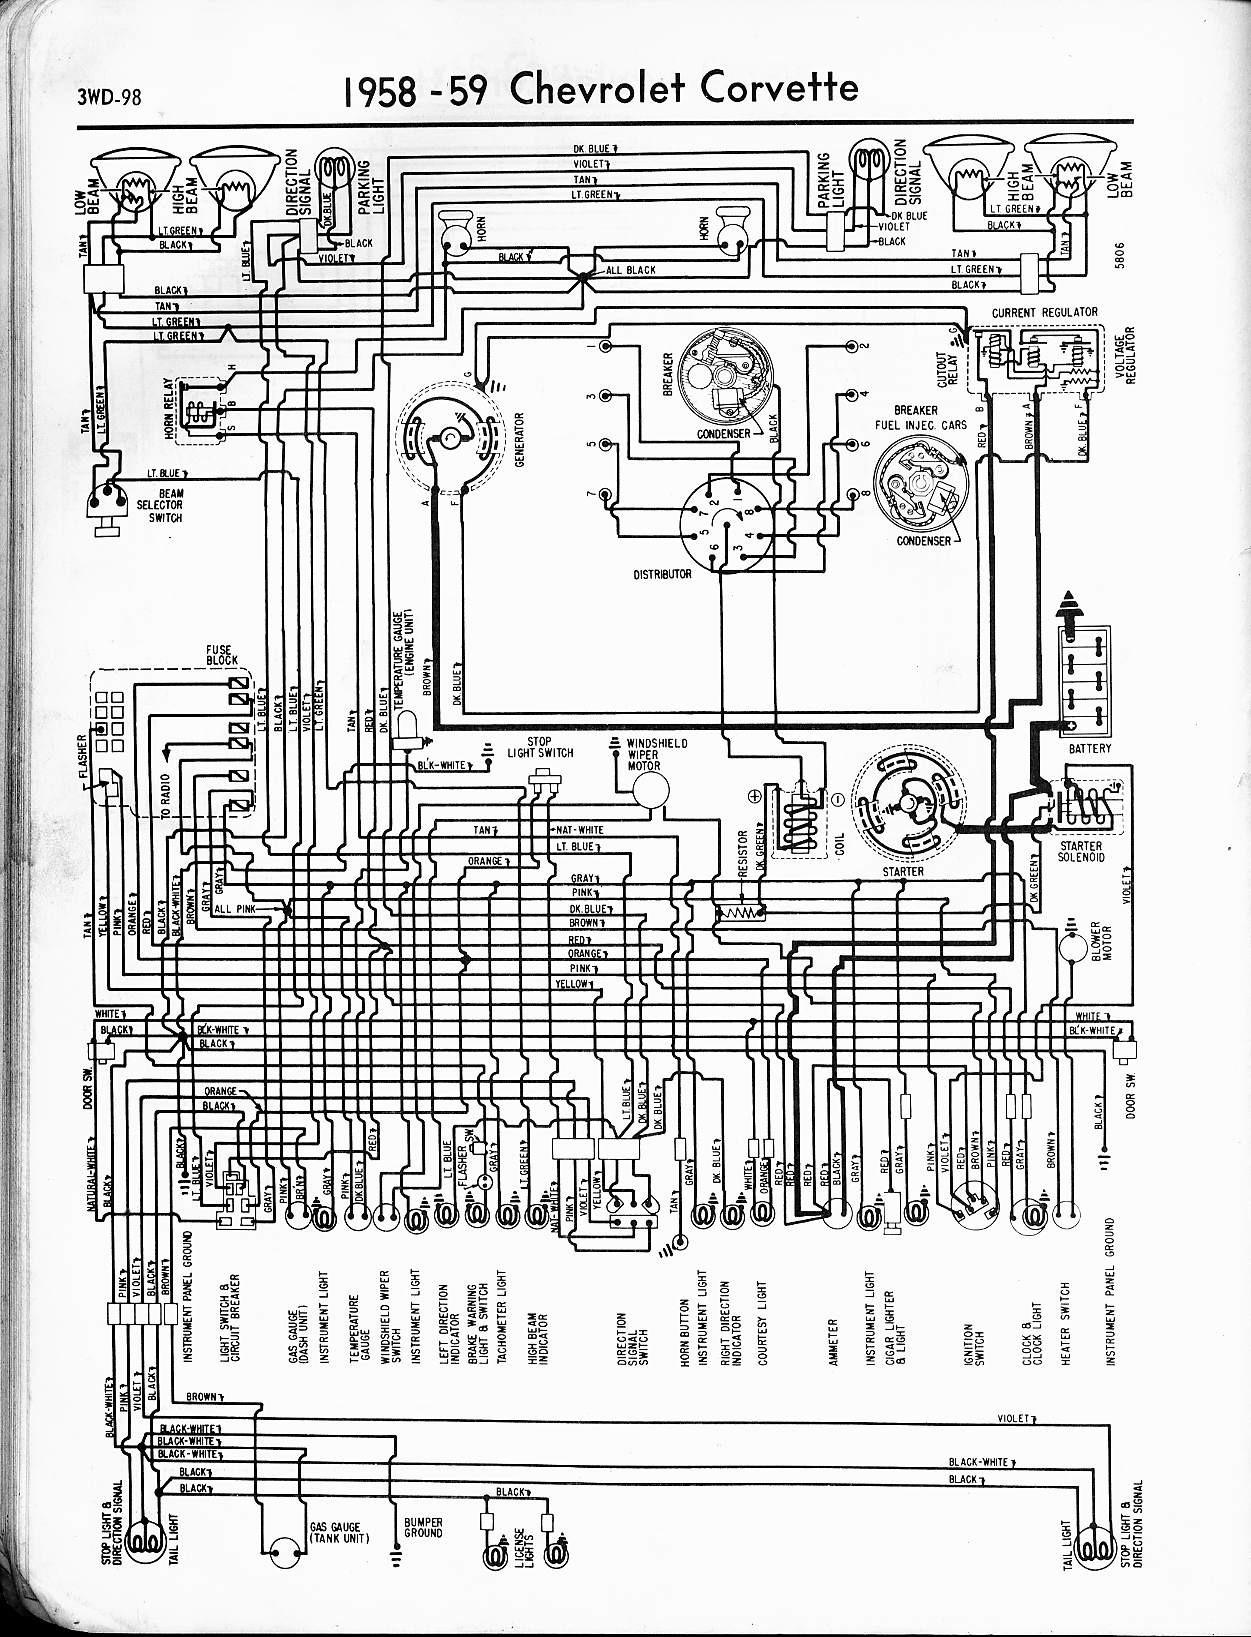 2002 impala wiring diagram 57 65 chevy wiring diagrams of 2002 impala wiring diagram chevrolet chevy